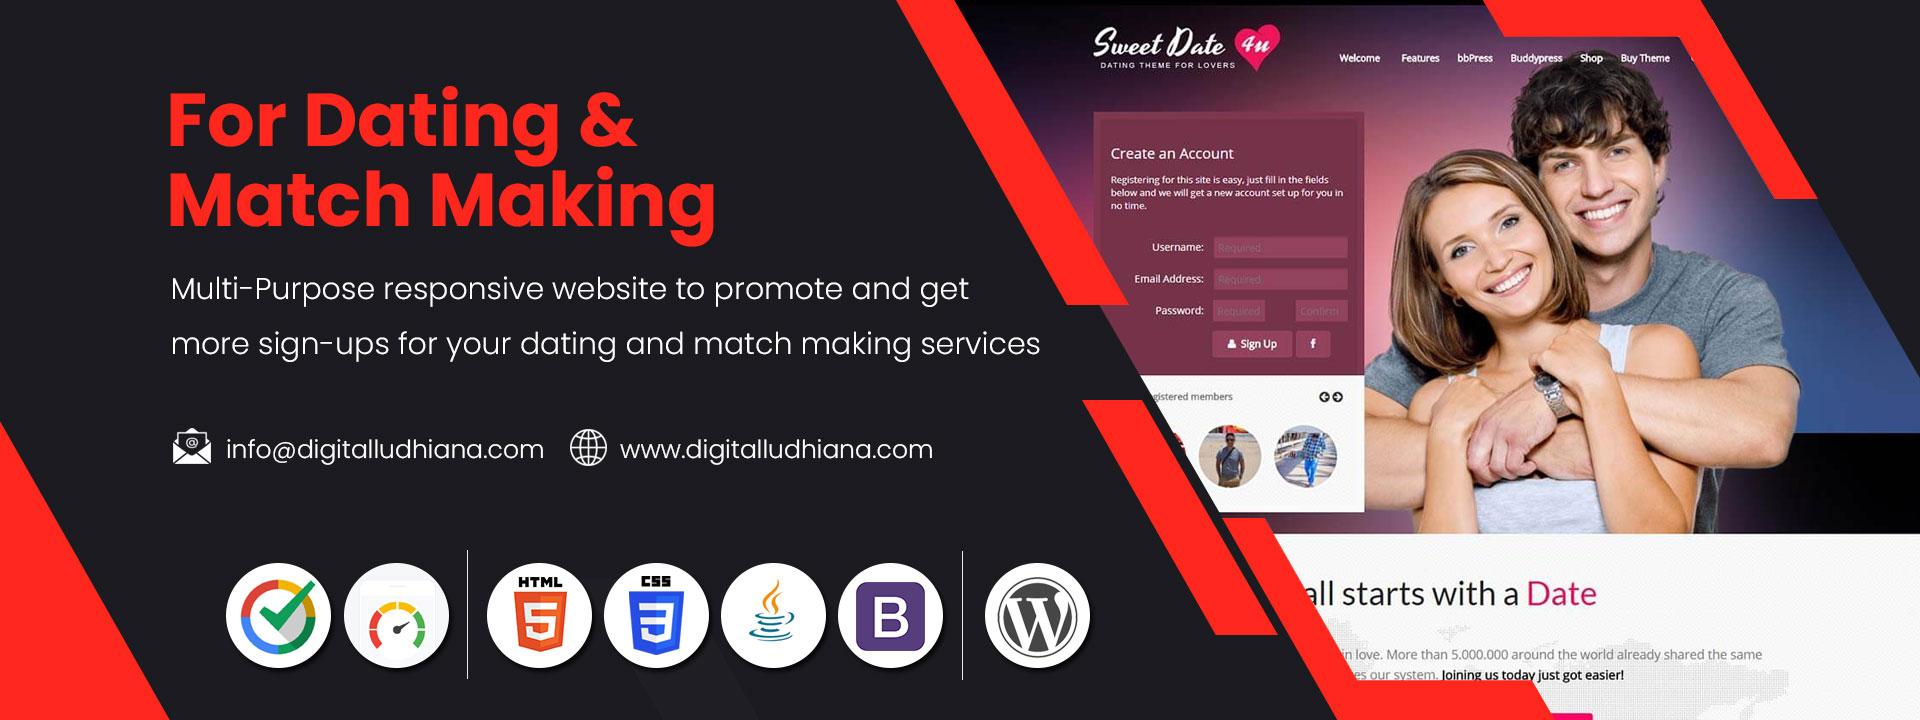 dating match making website designing company in ludhiana punjab india